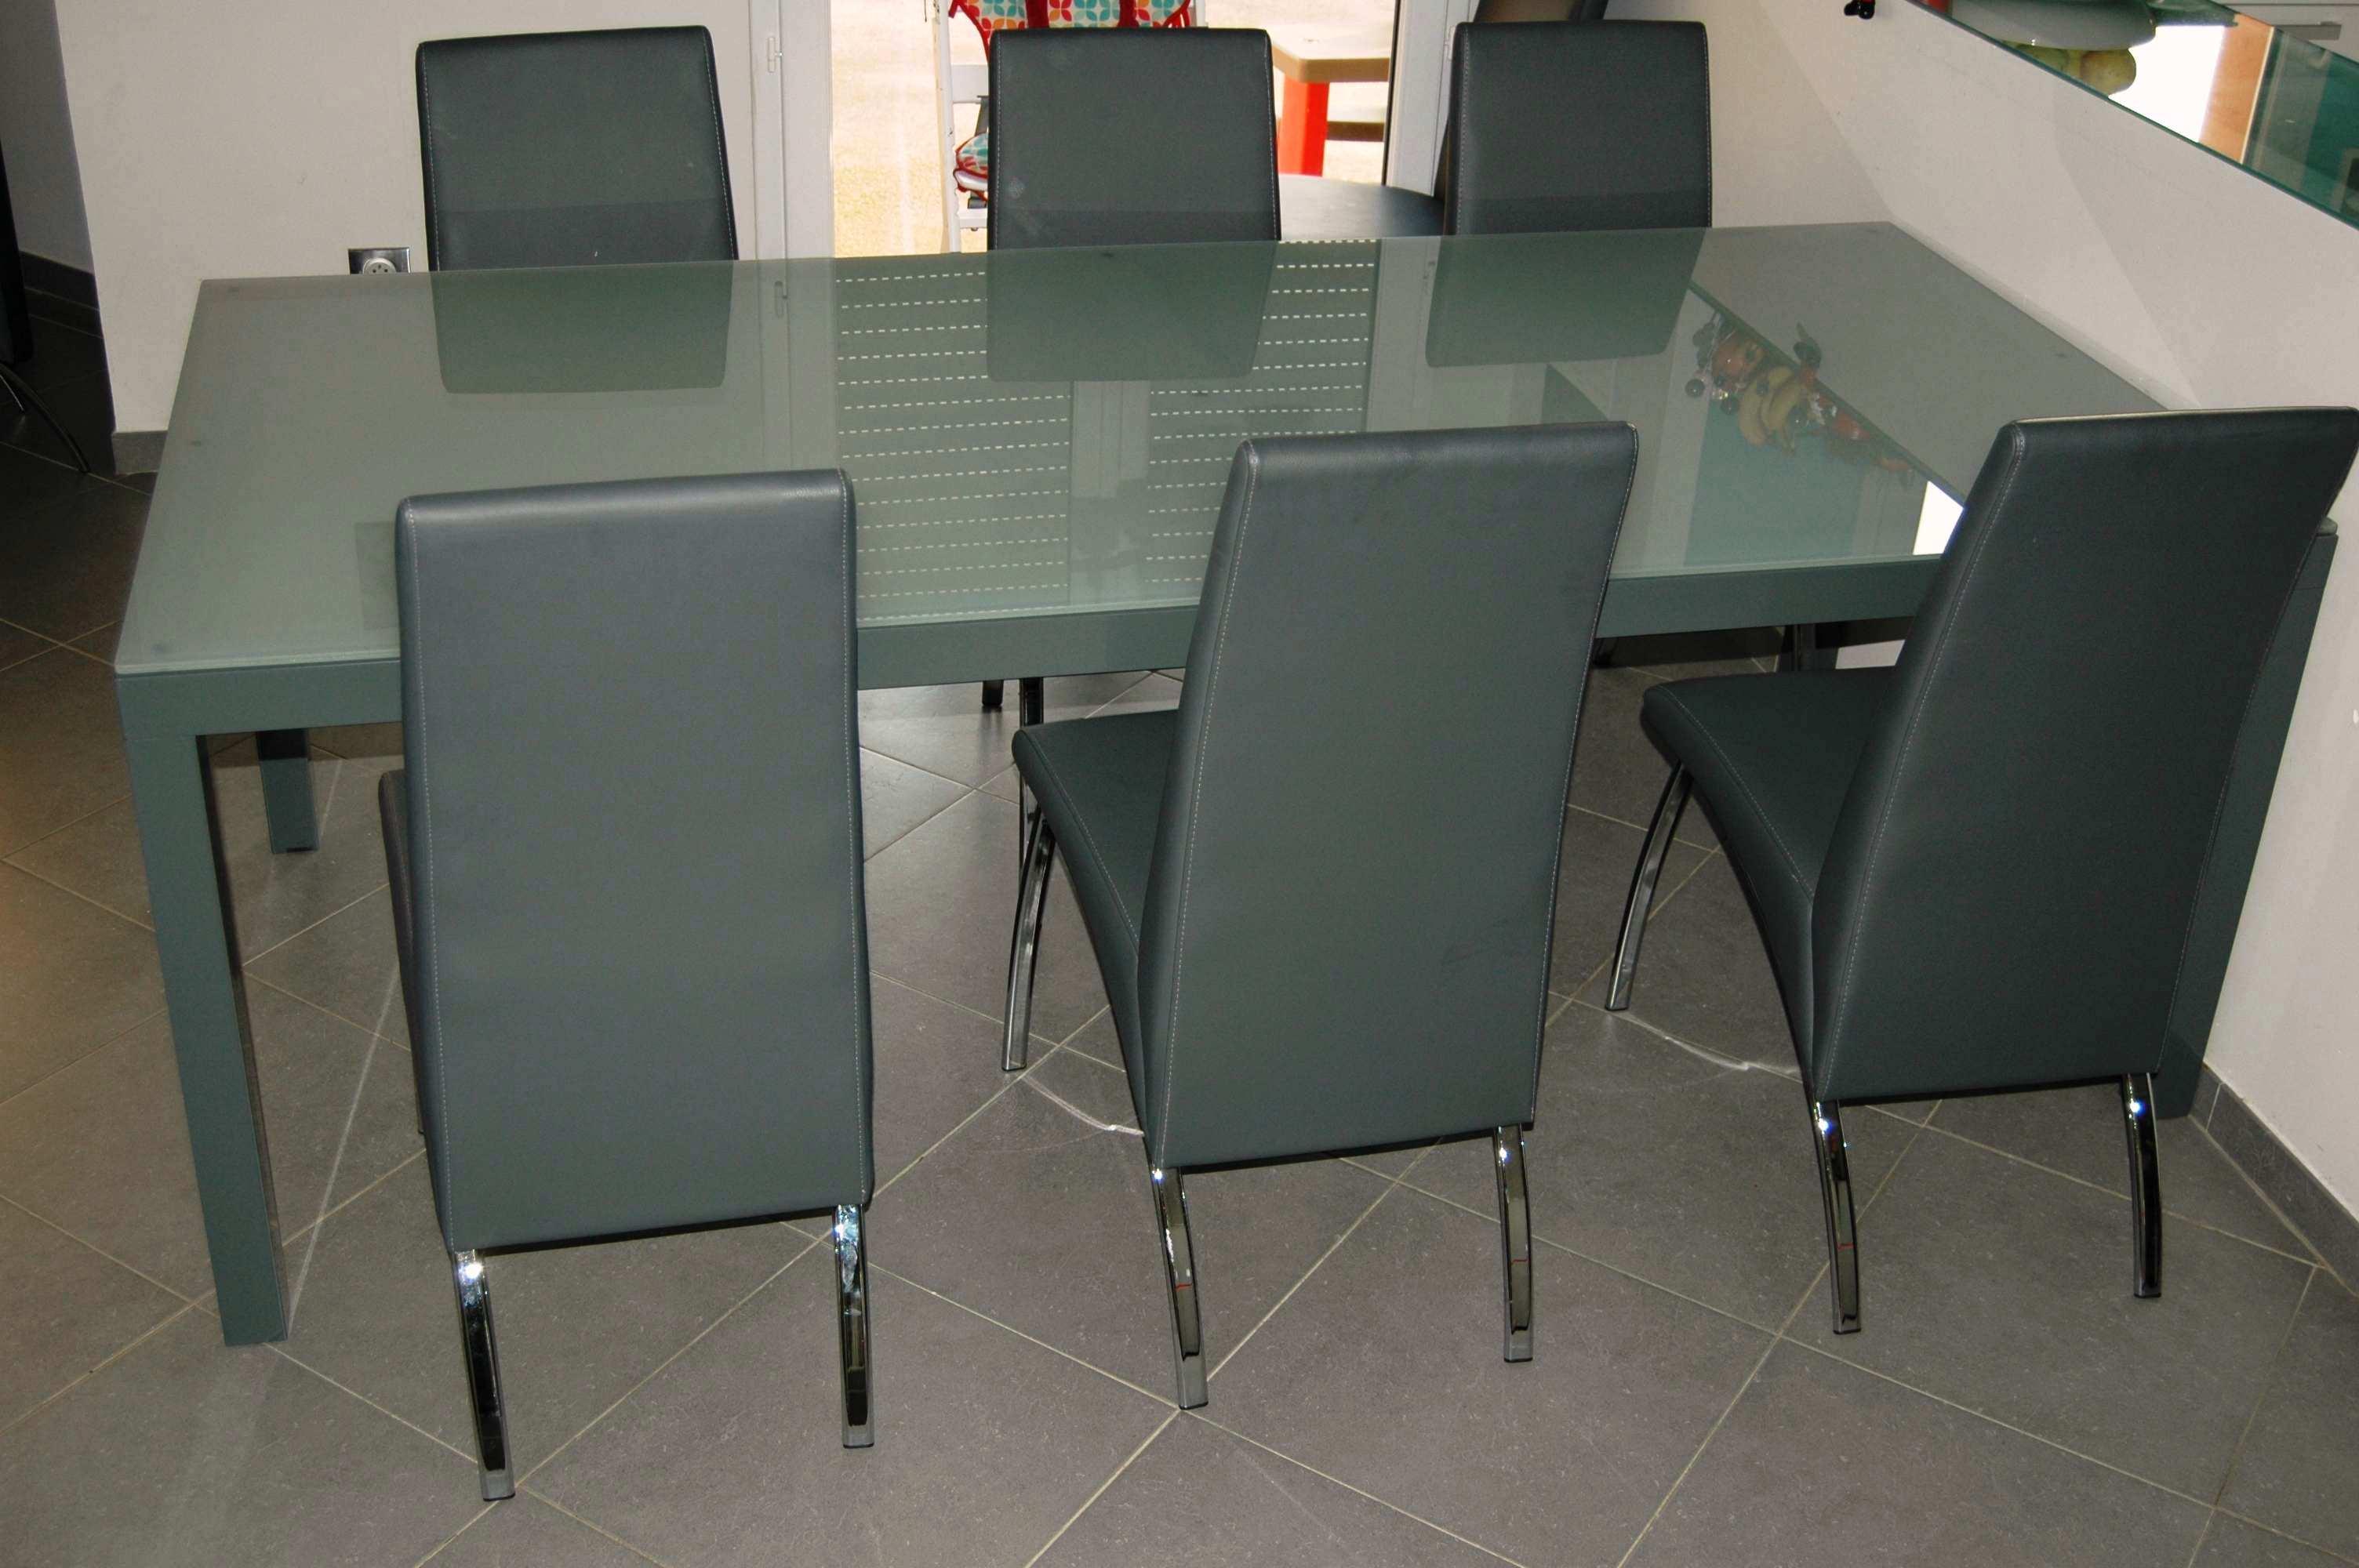 Table en aluminium avec plateau de verre